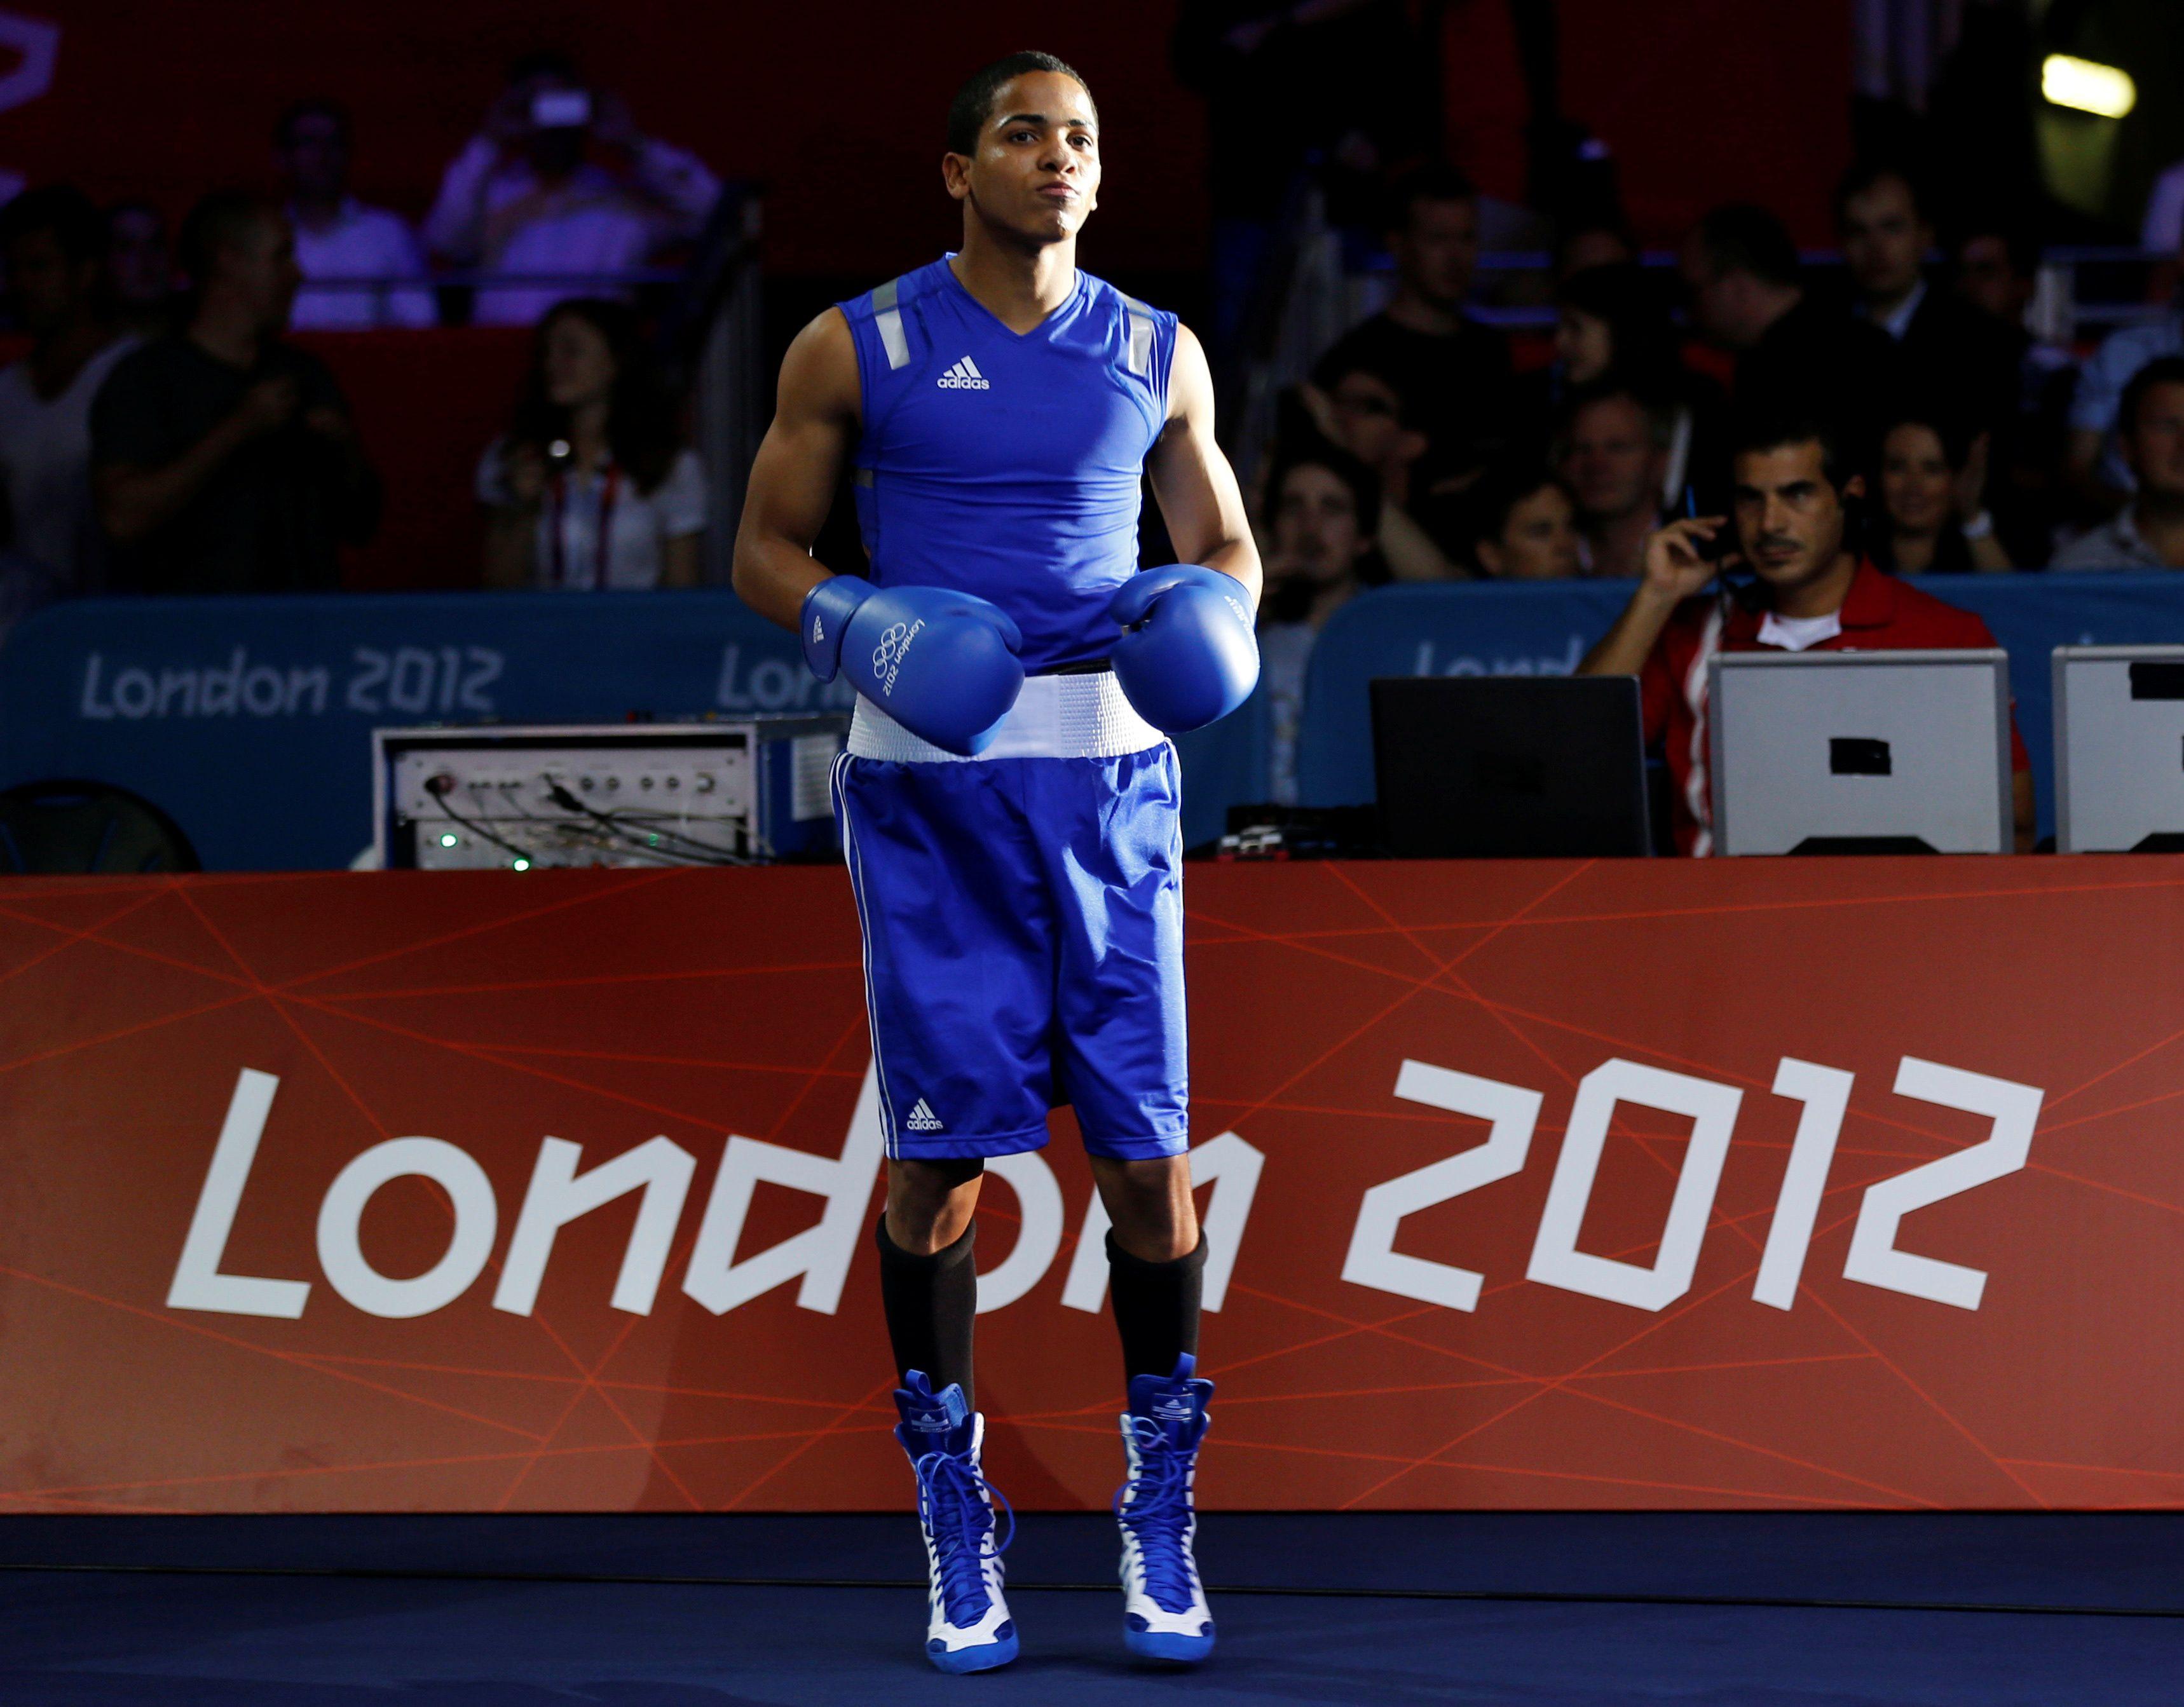 El boxeador representó a Puerto Rico en los JJOO de 2012 (REUTERS/Murad Sezer/File Photo)